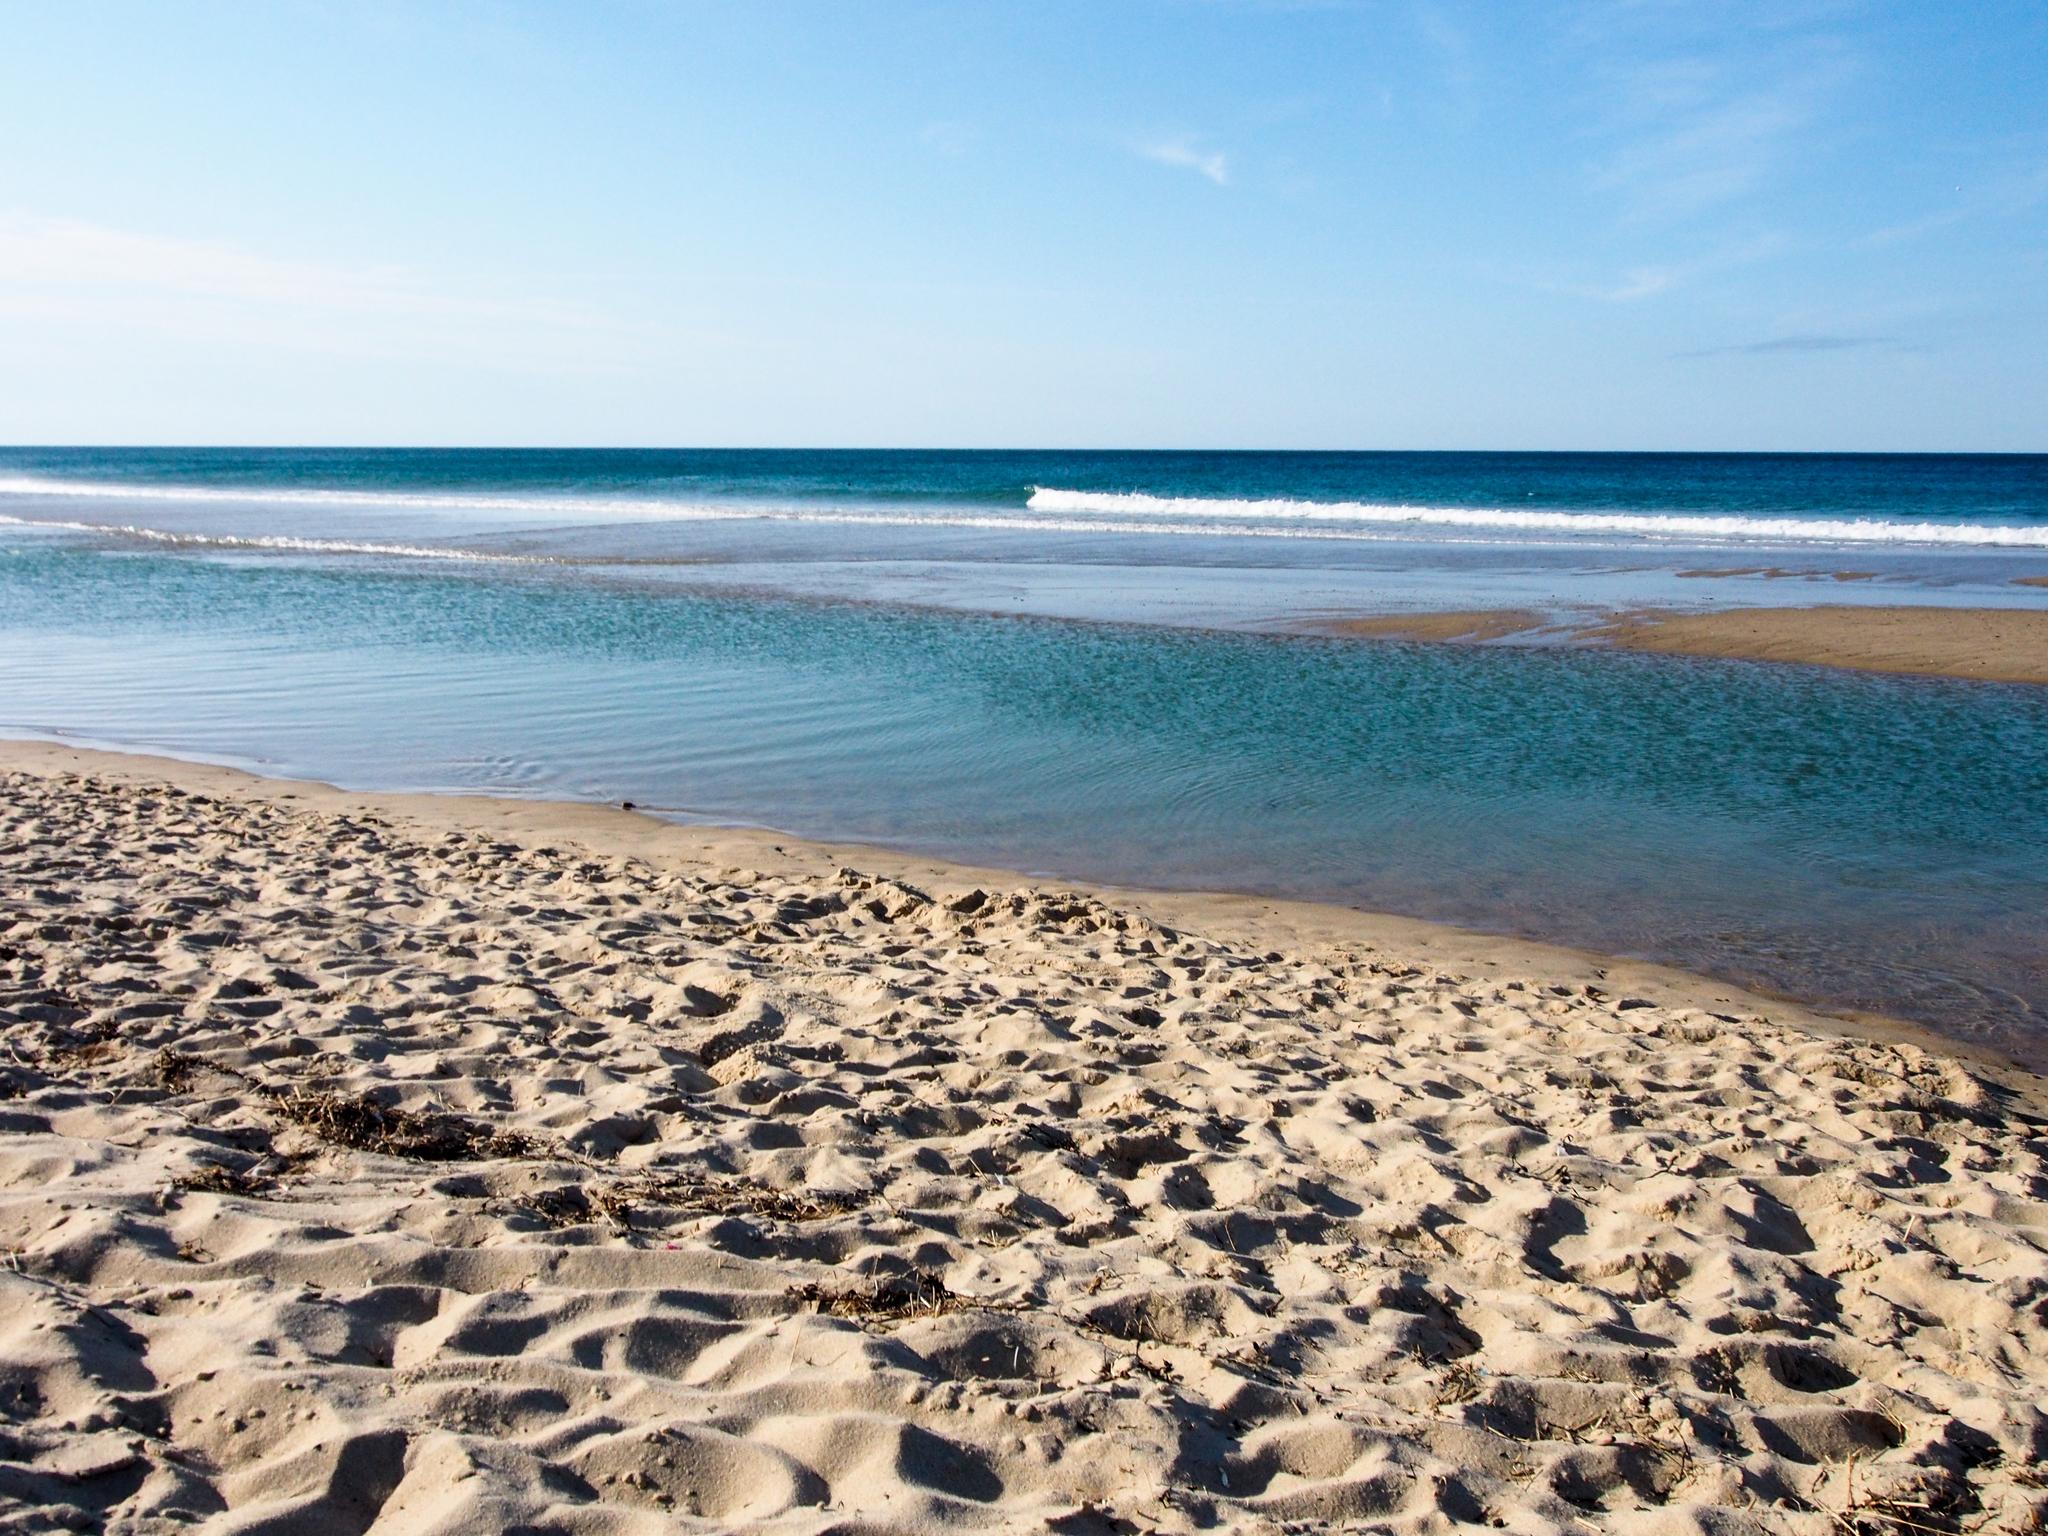 Head of the Meadow Beach - Cape Cod National Seashore